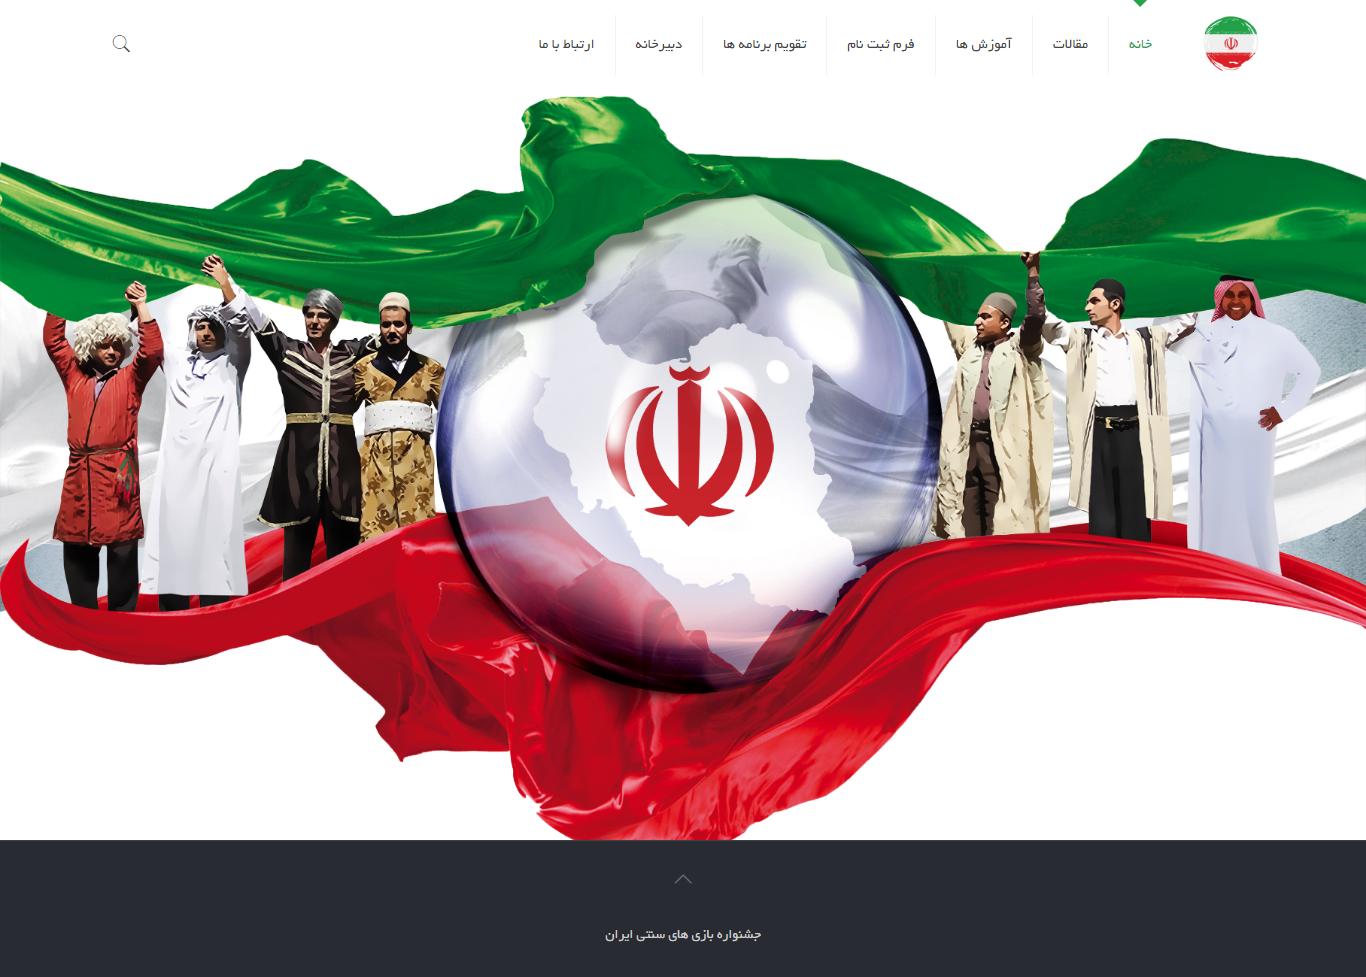 http://iraniangames.ir/